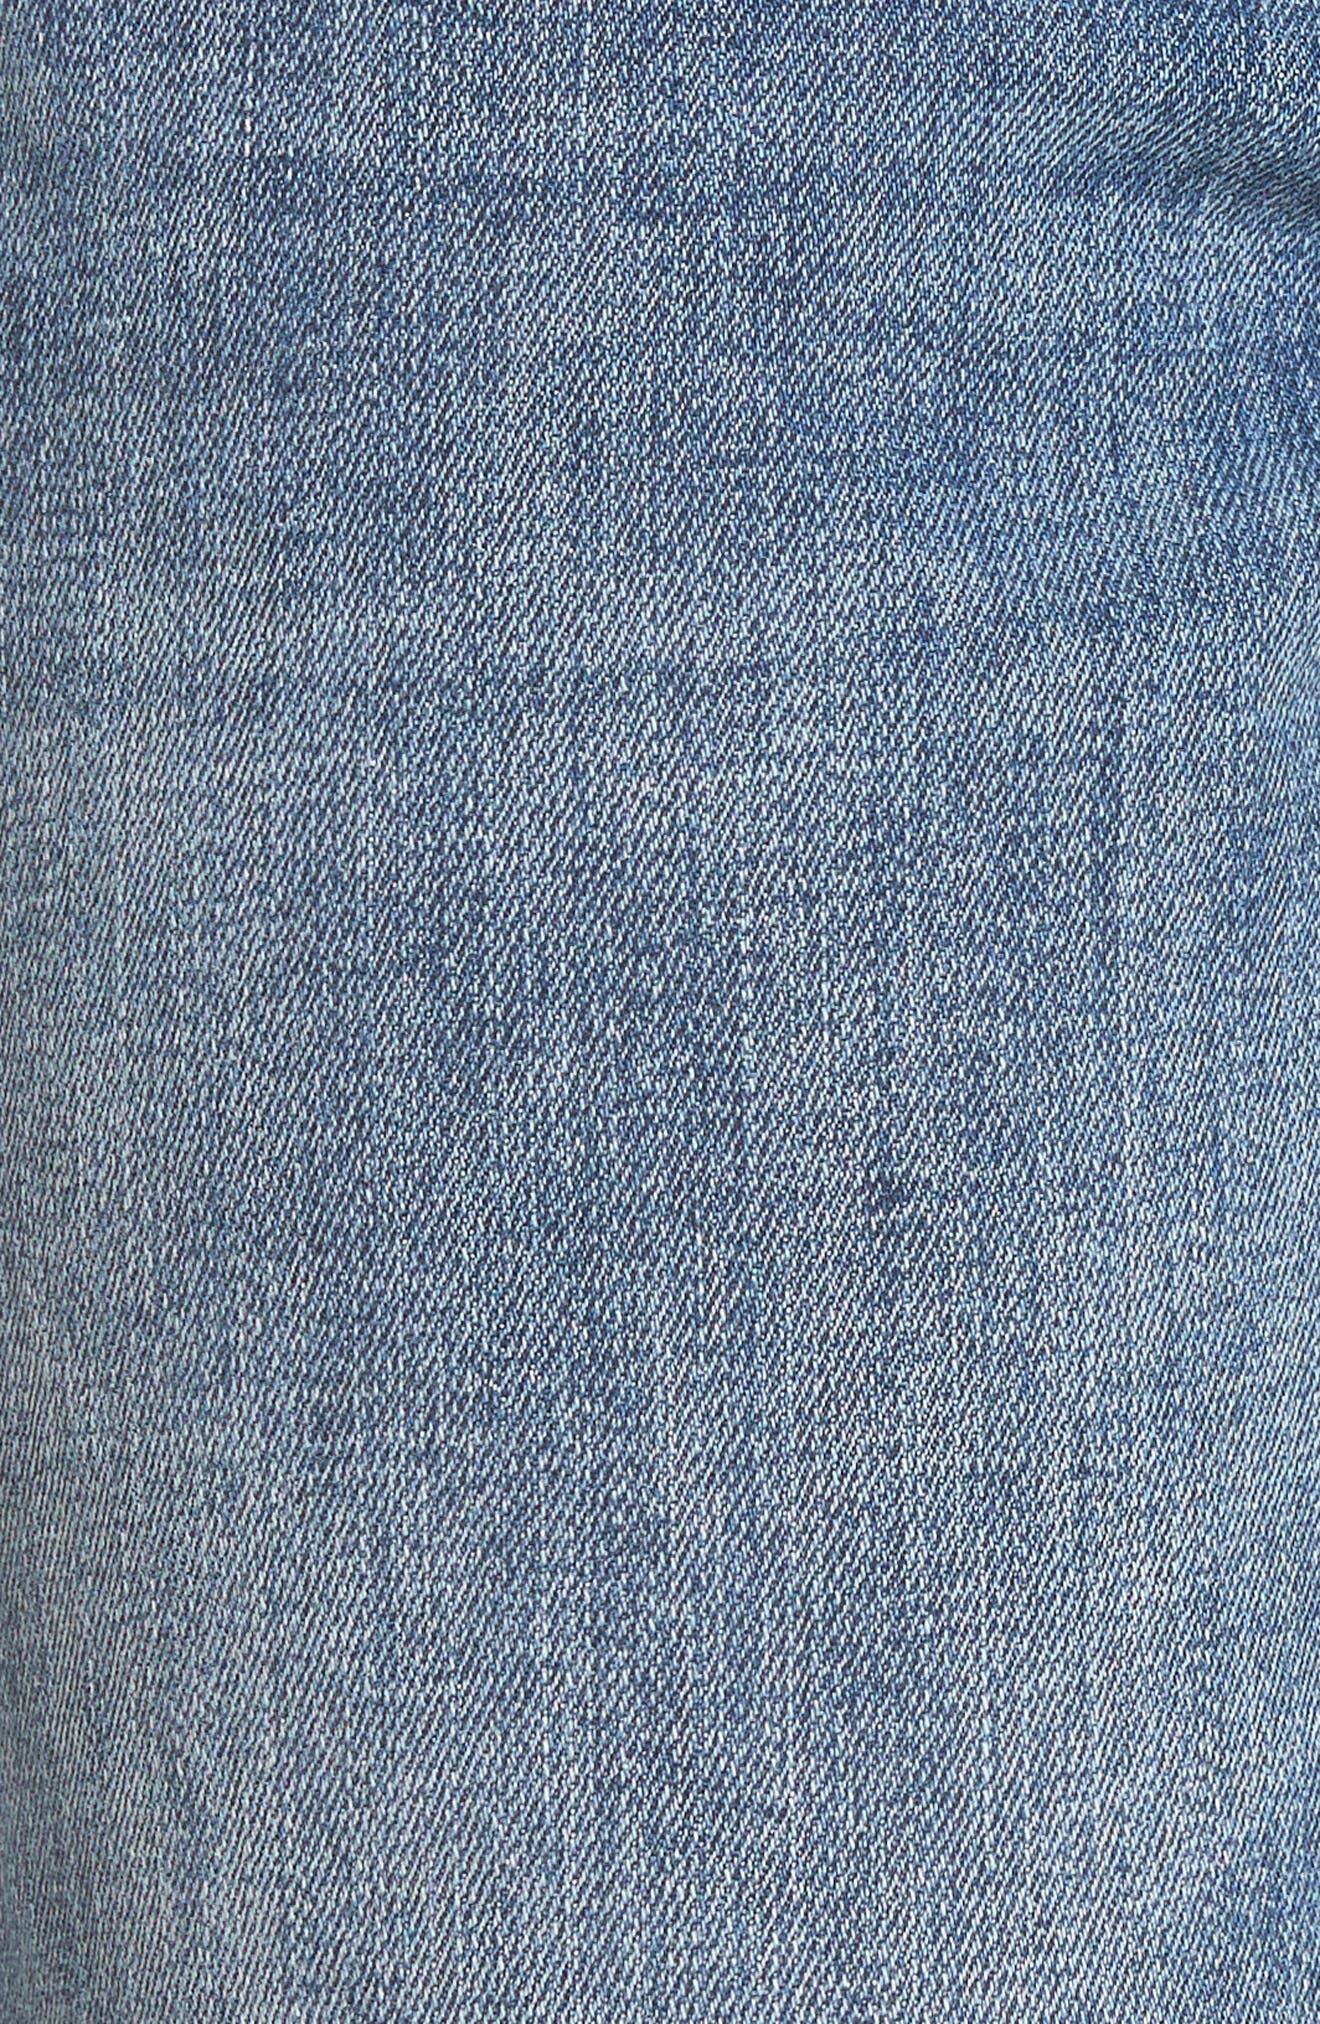 Davis Ankle Girlfriend Jeans,                             Alternate thumbnail 6, color,                             425